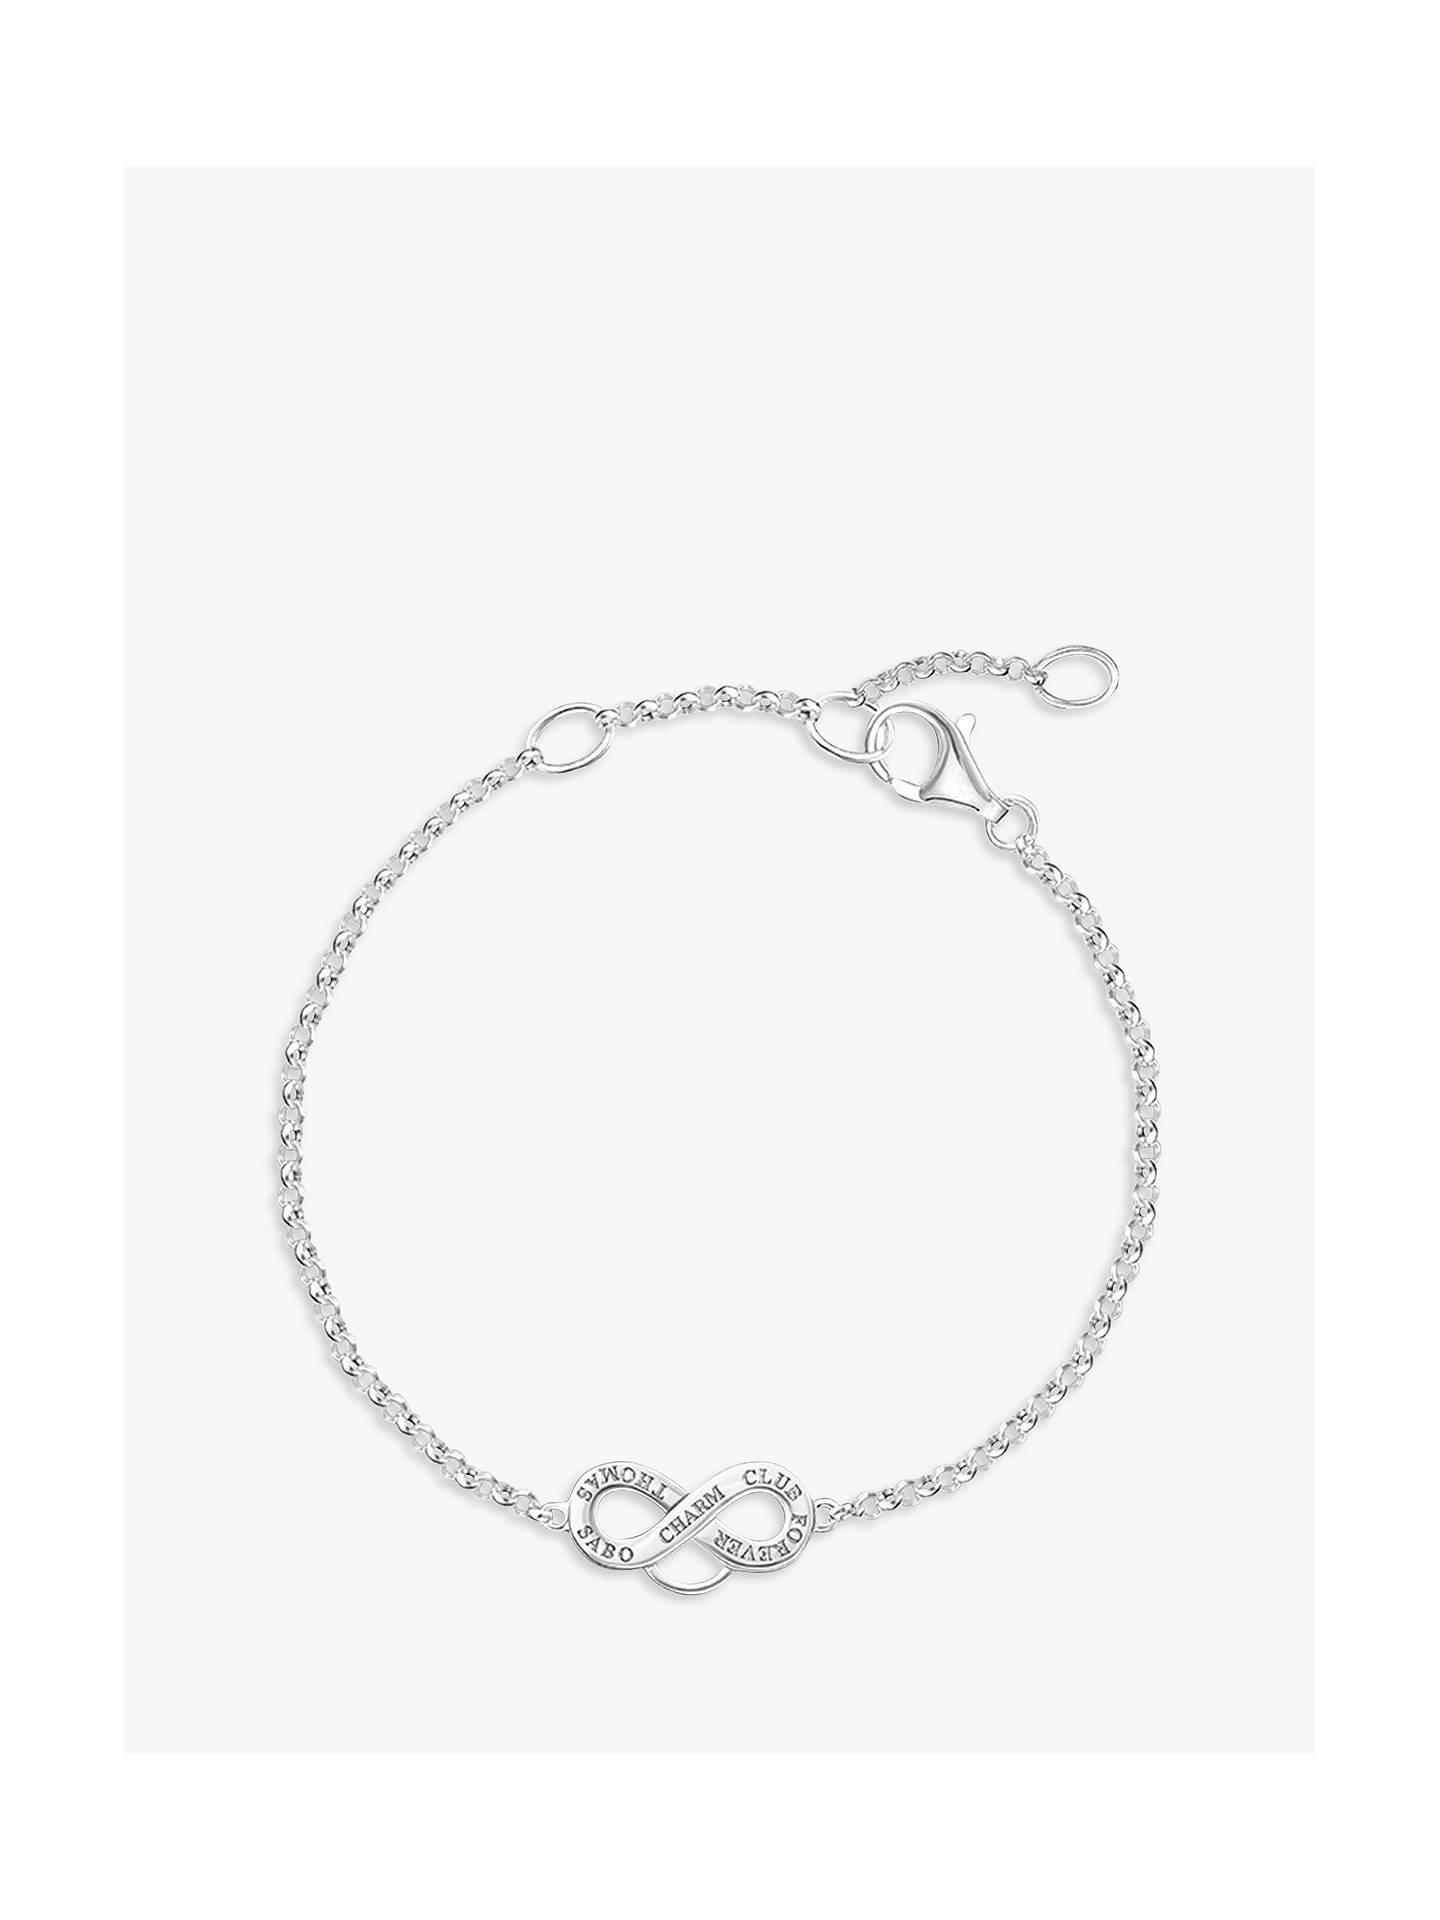 Thomas Sabo Charm Club Infinity Symbol Bracelet Silver At John